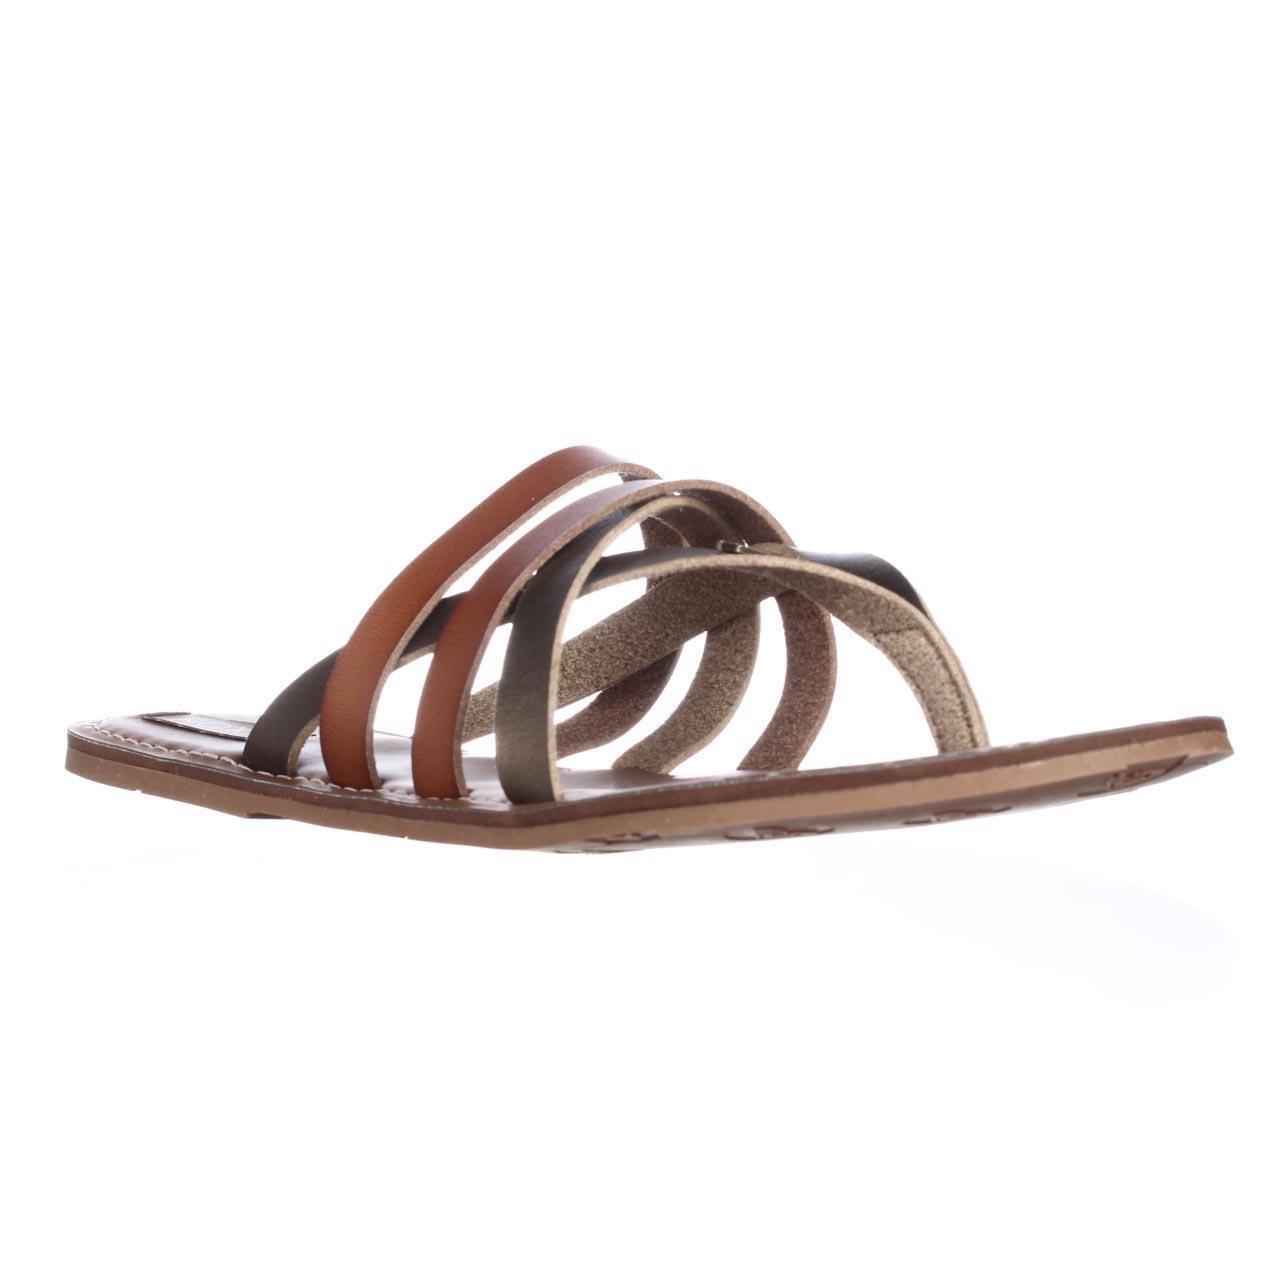 Womens Roxy Cyprus Flat Slide Thong Sandals - Gold